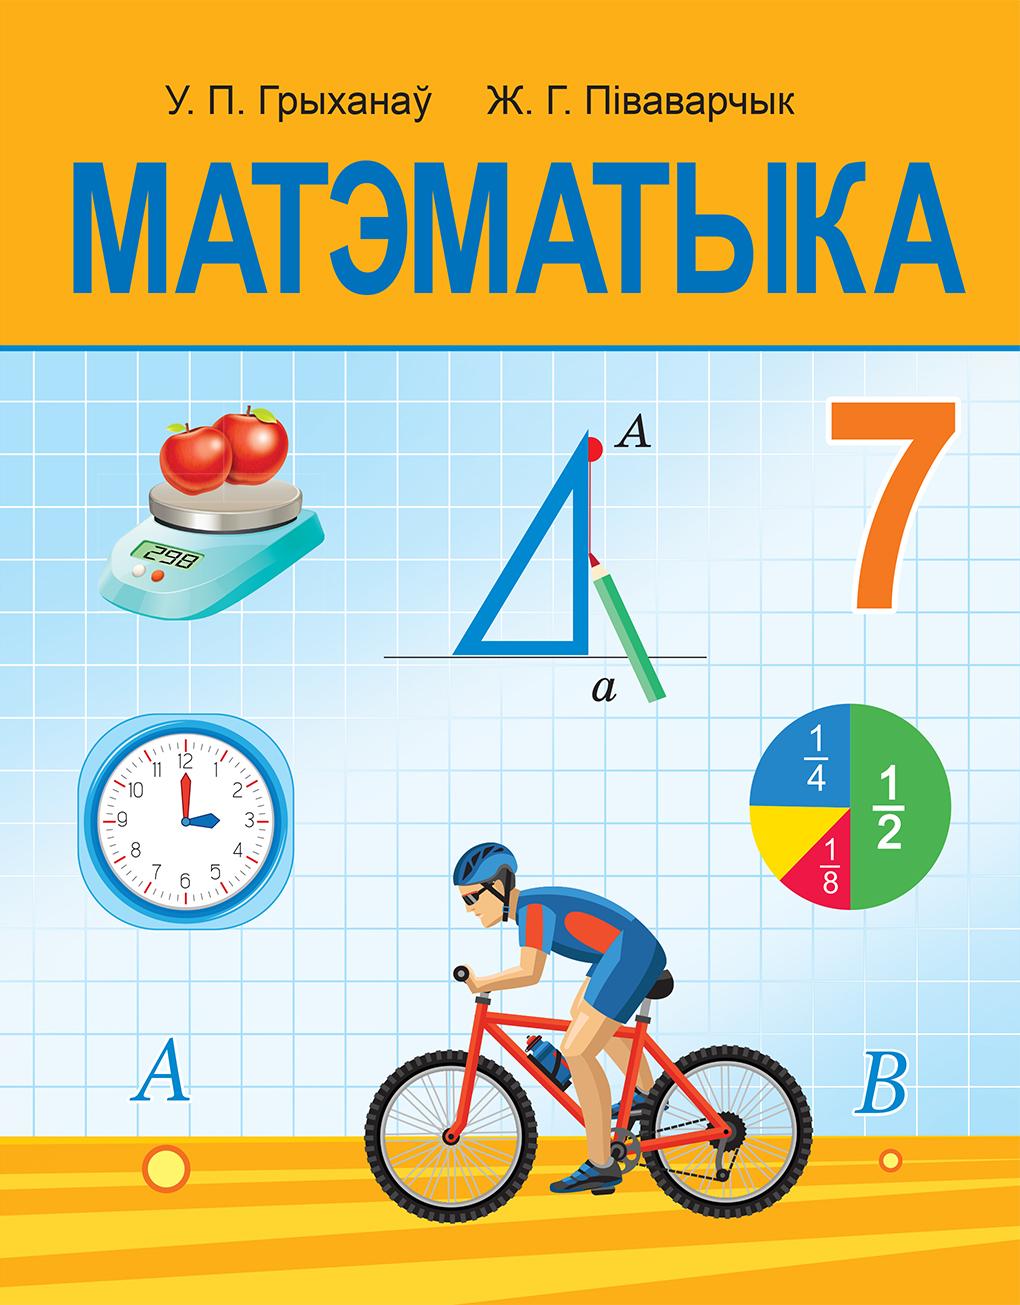 Матэматыка, 7 клас